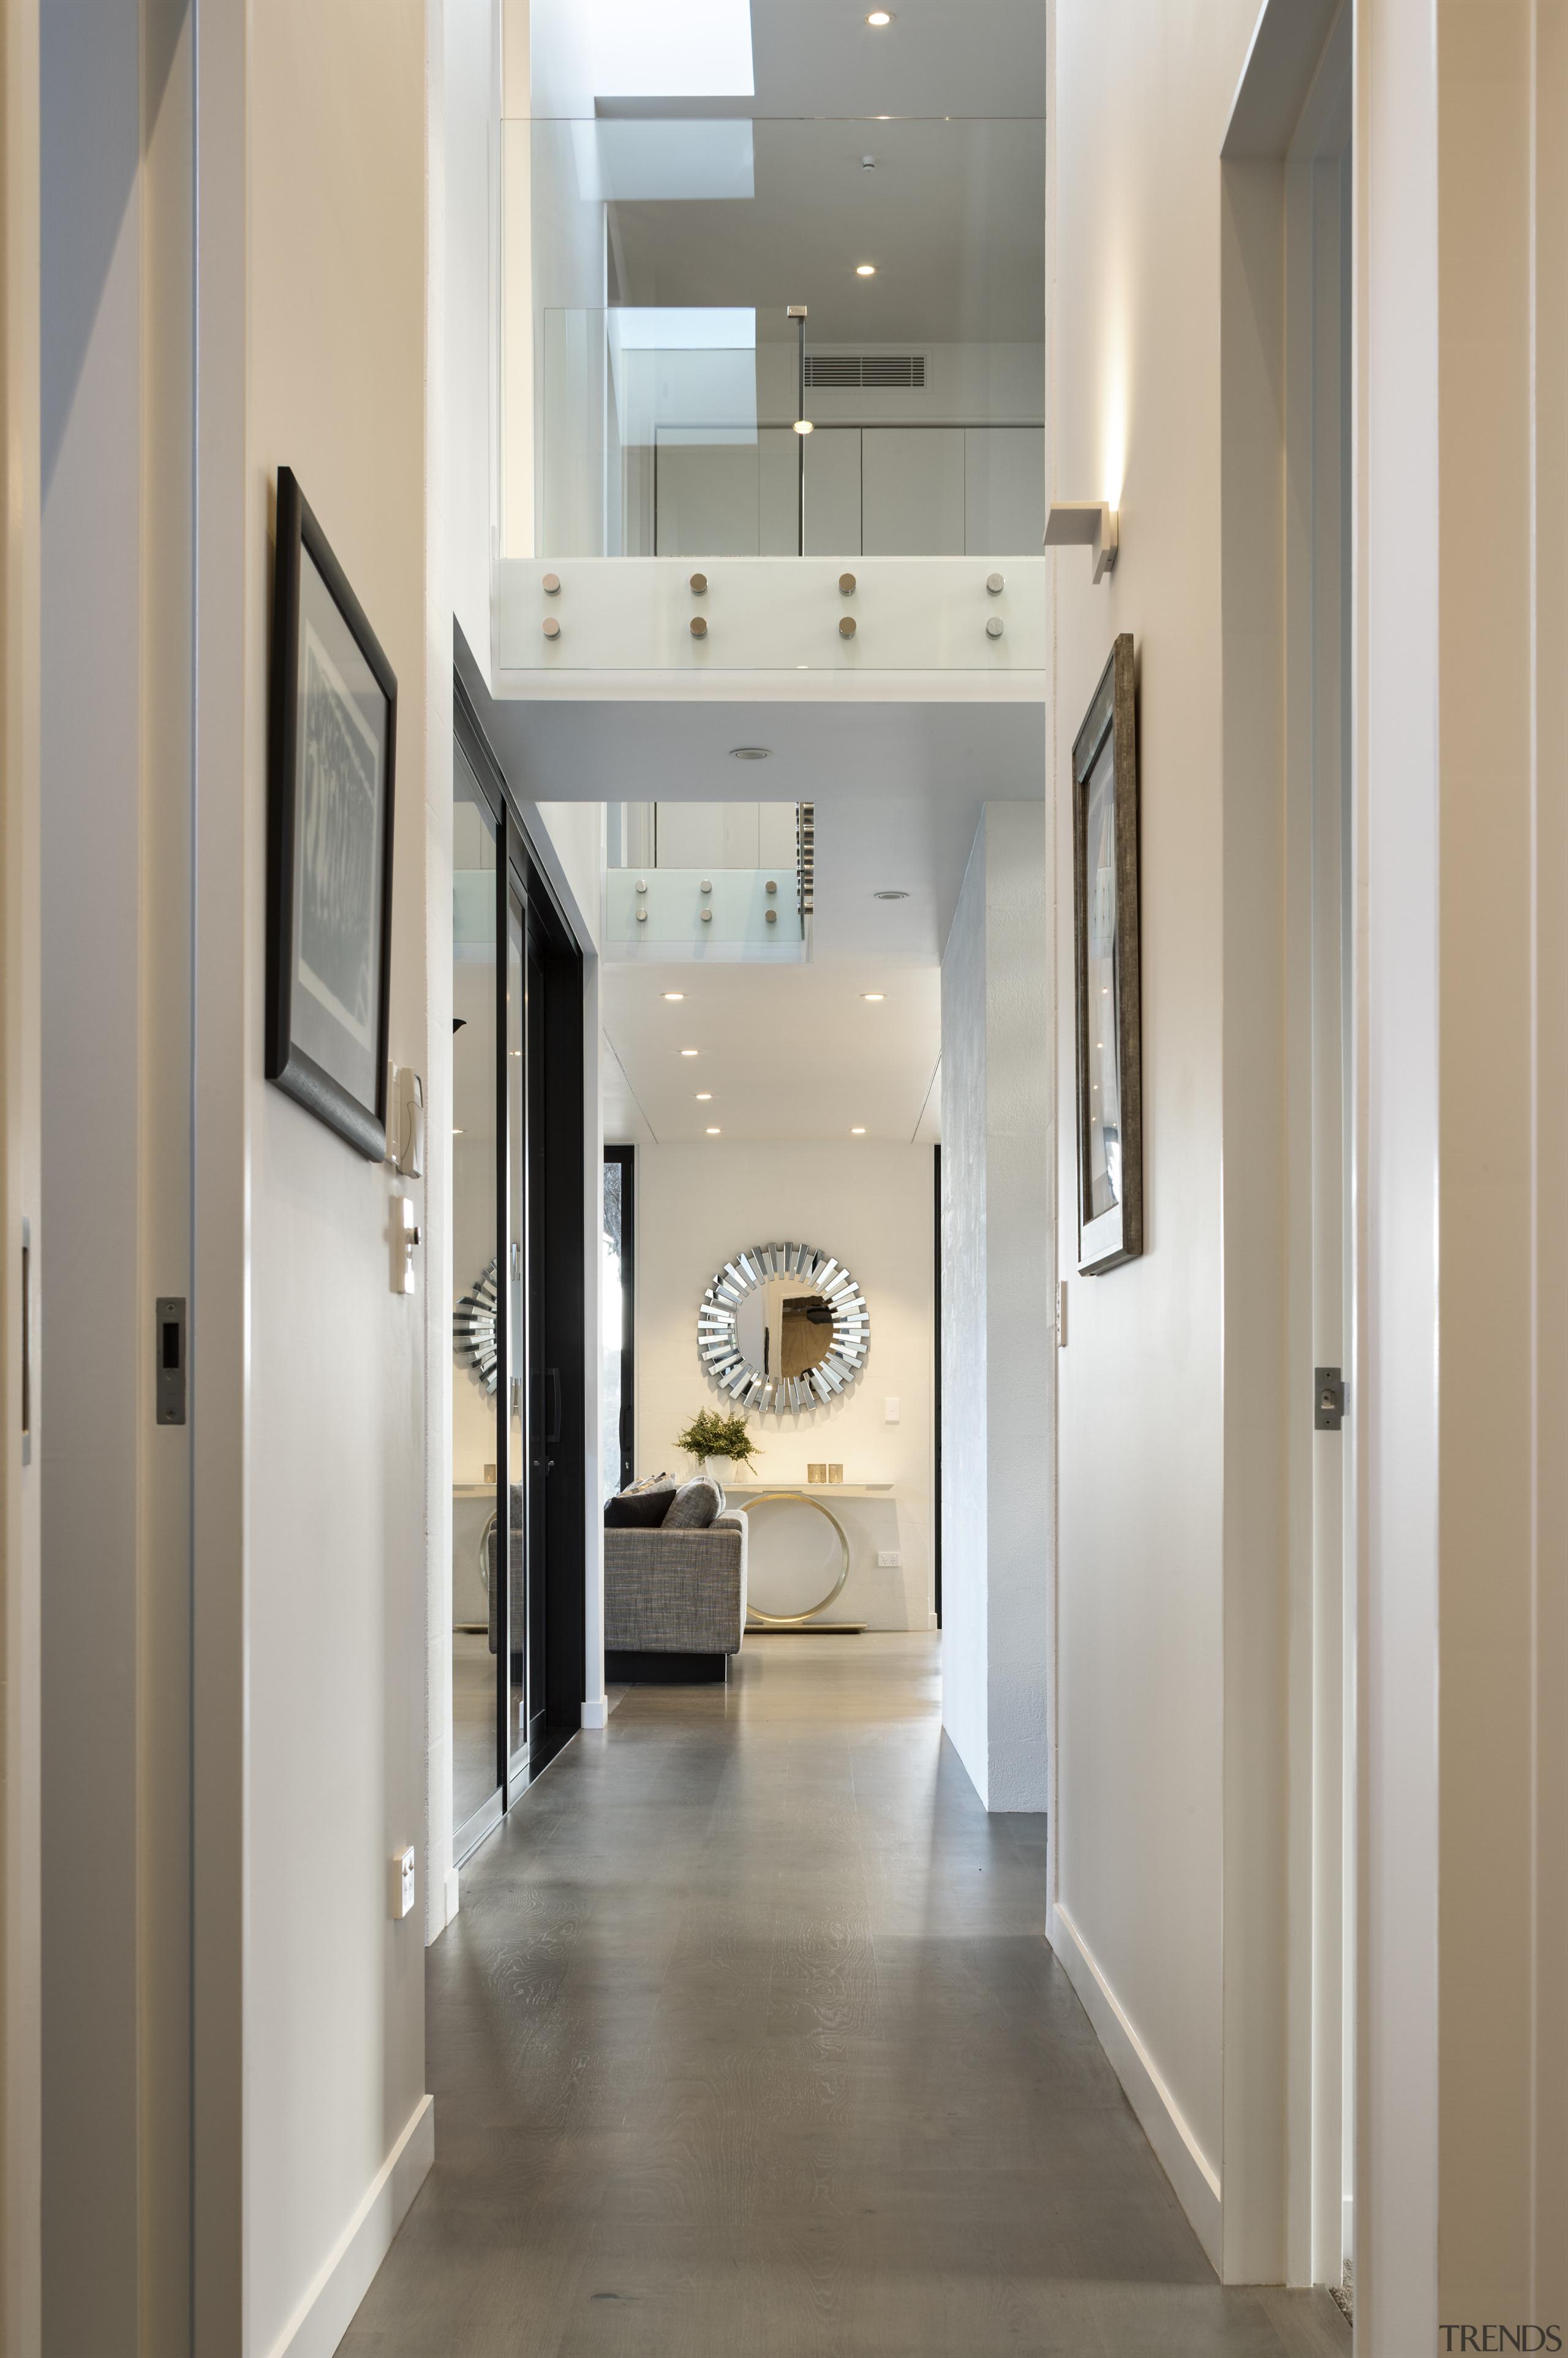 New two-storey coastal home, with upper level bridge ceiling, floor, flooring, hall, interior design, gray